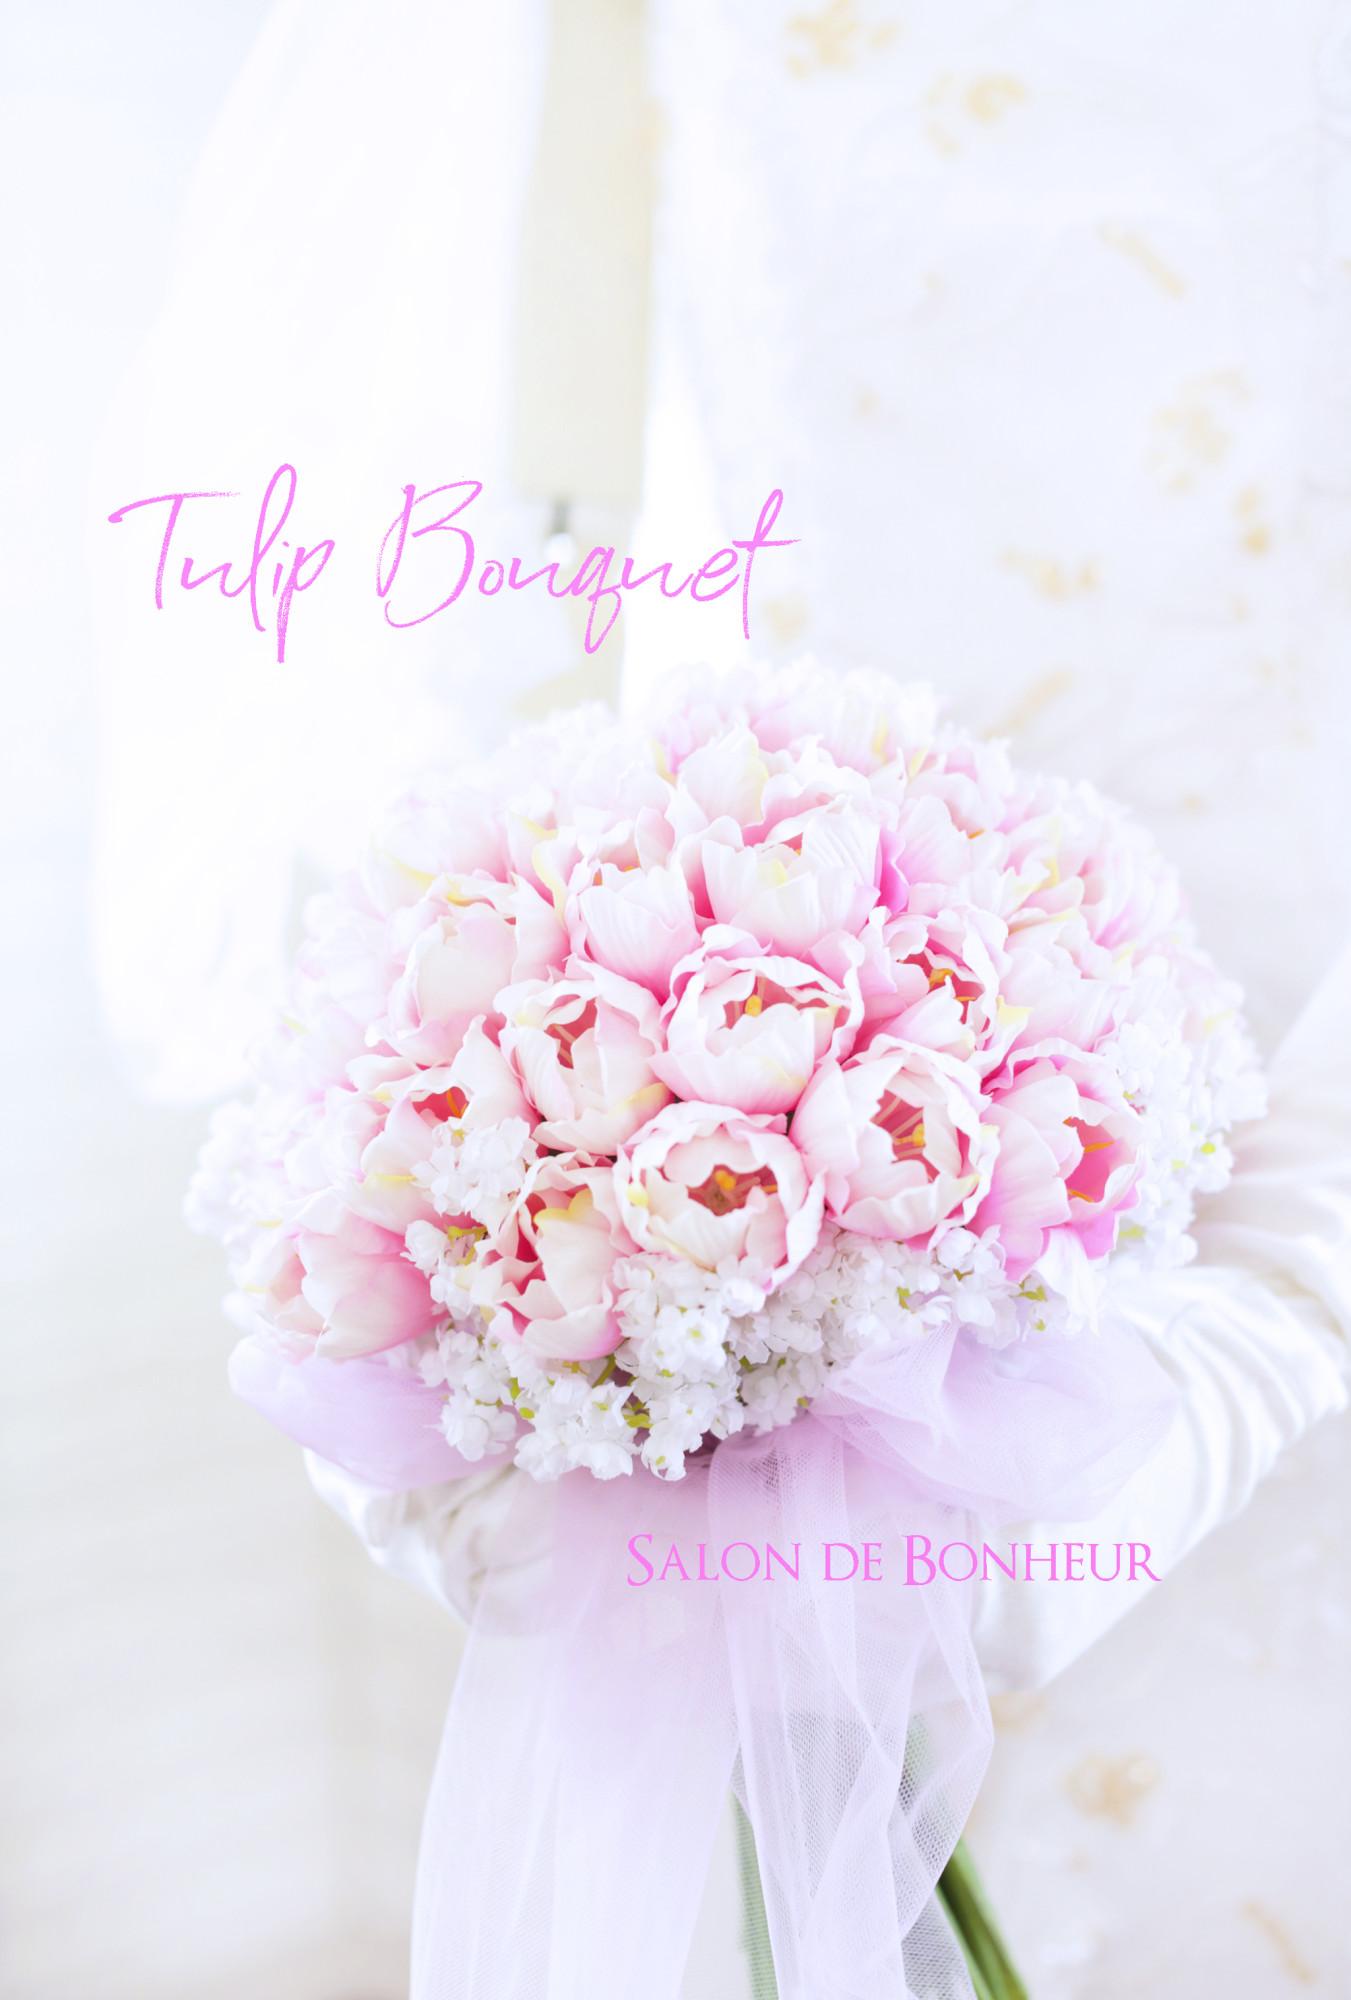 b_bouquet20180217_2